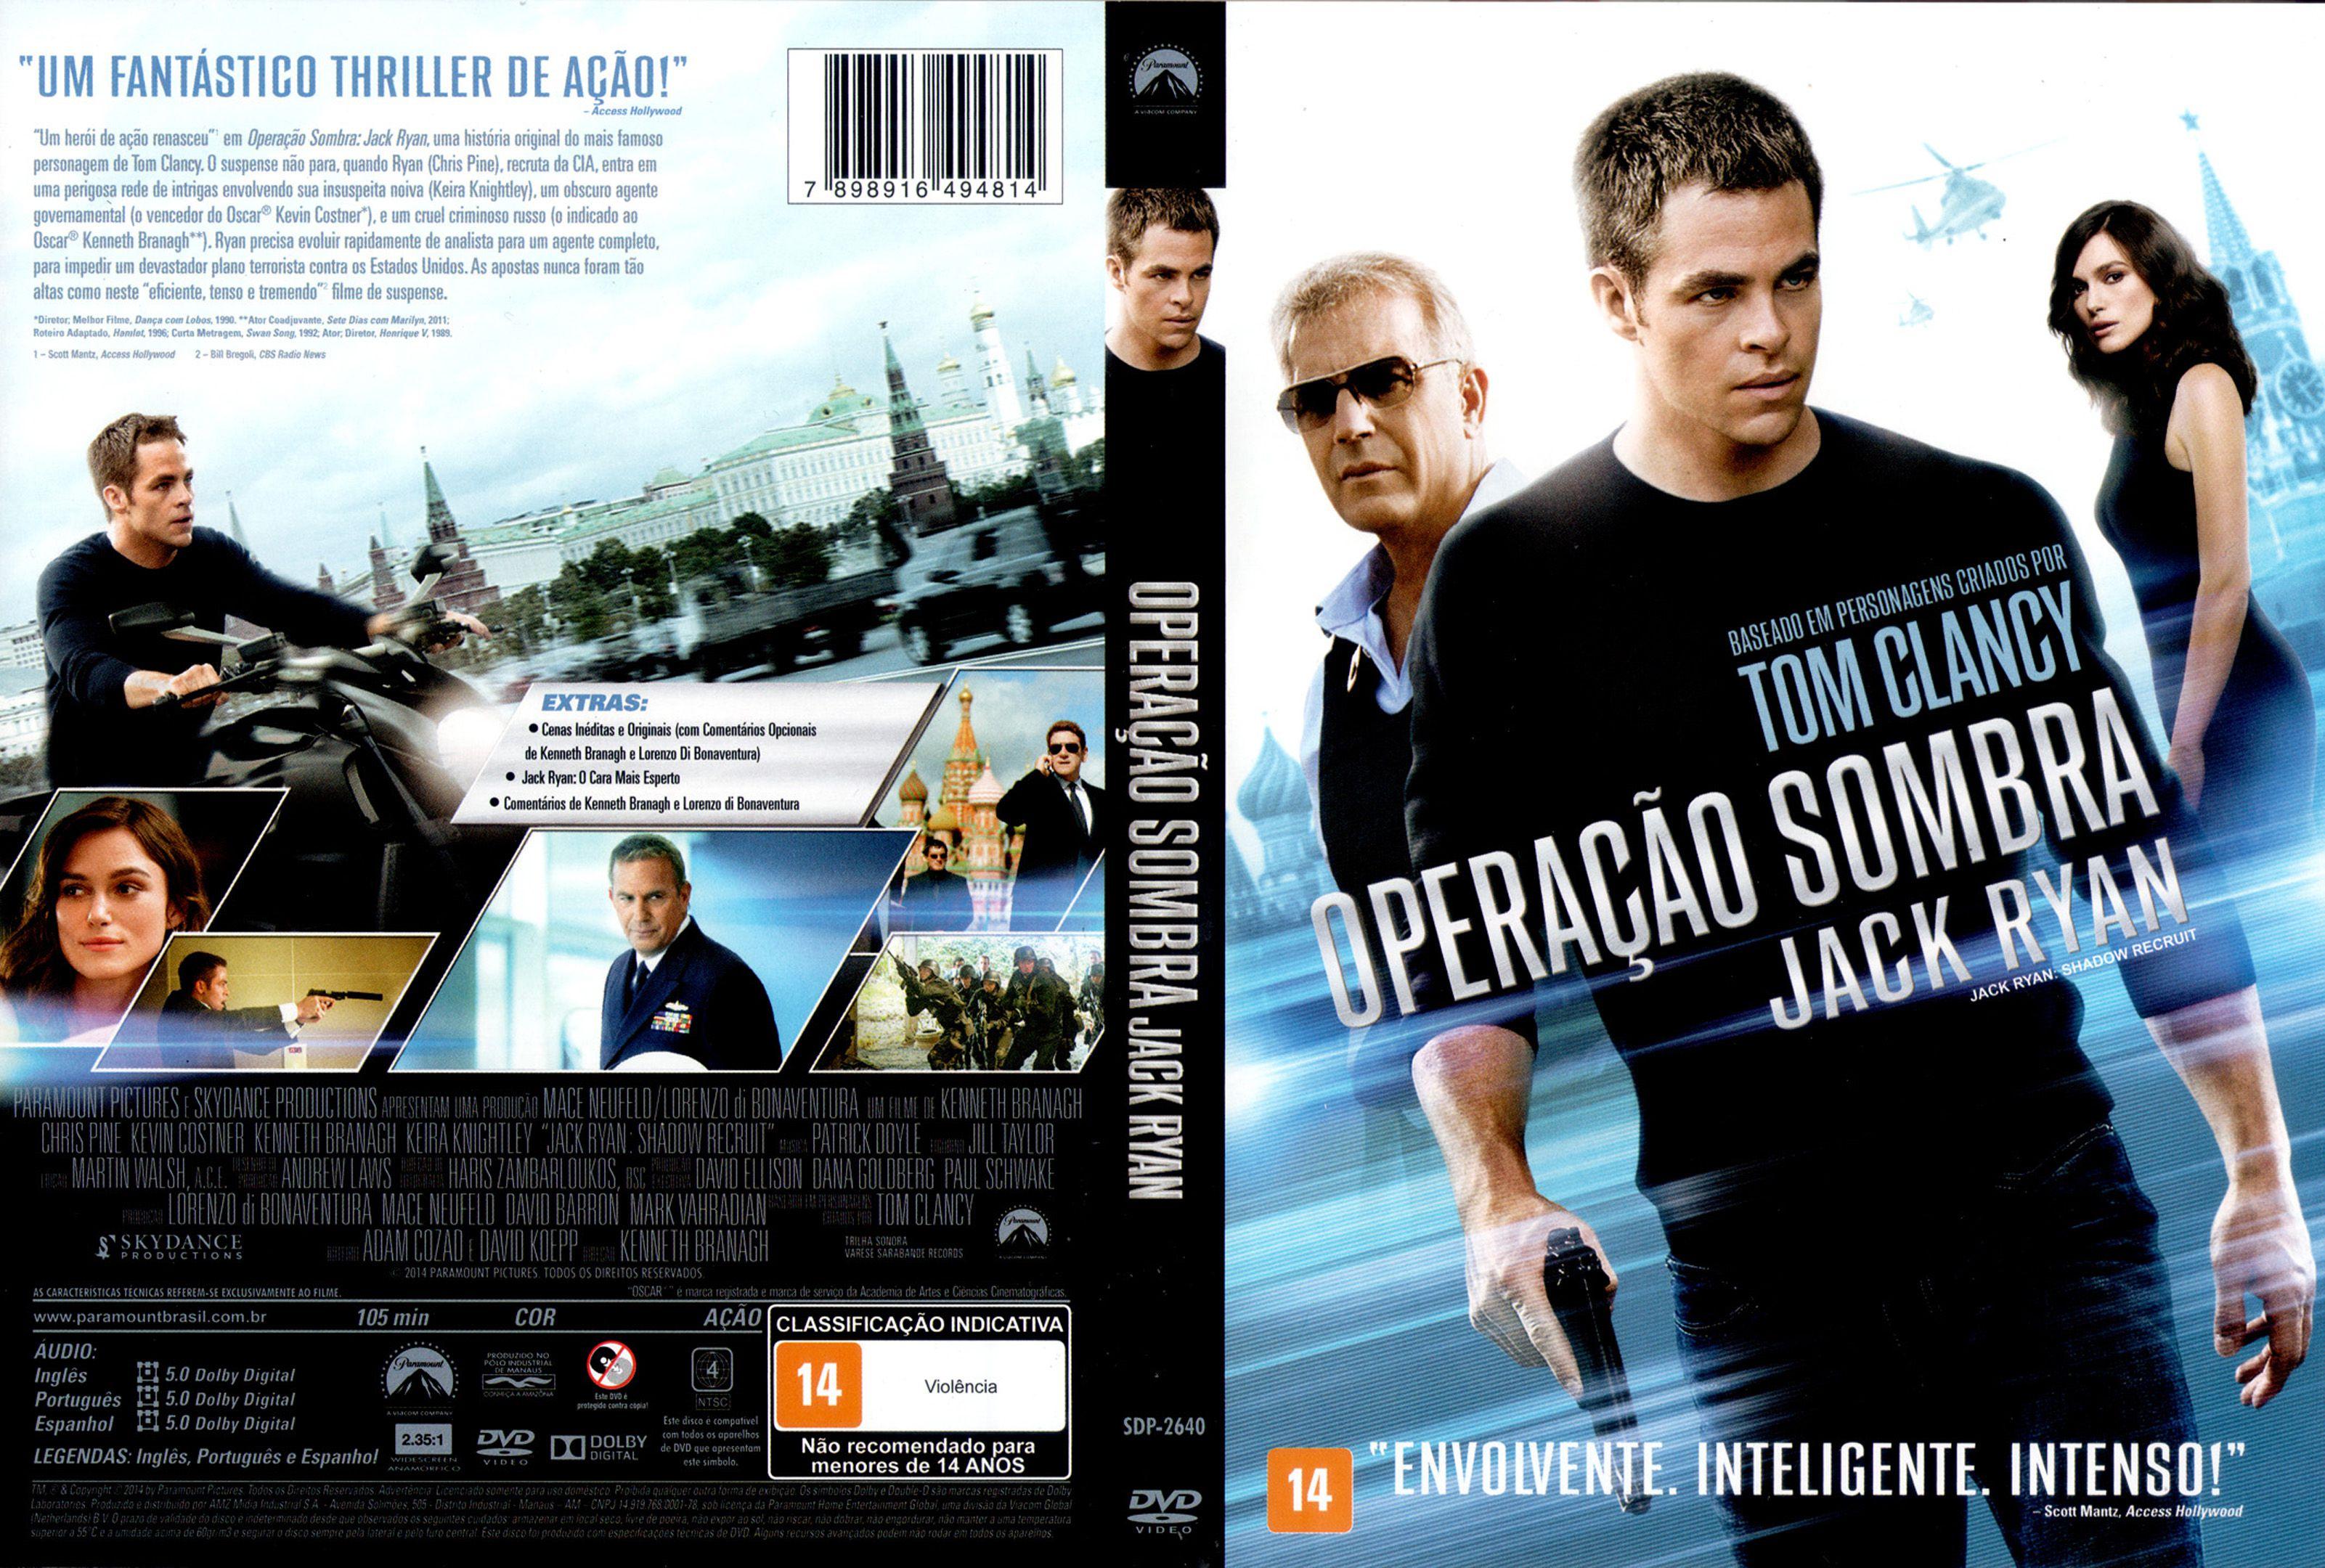 Capa DVD Operação Sombra Jack Ryan